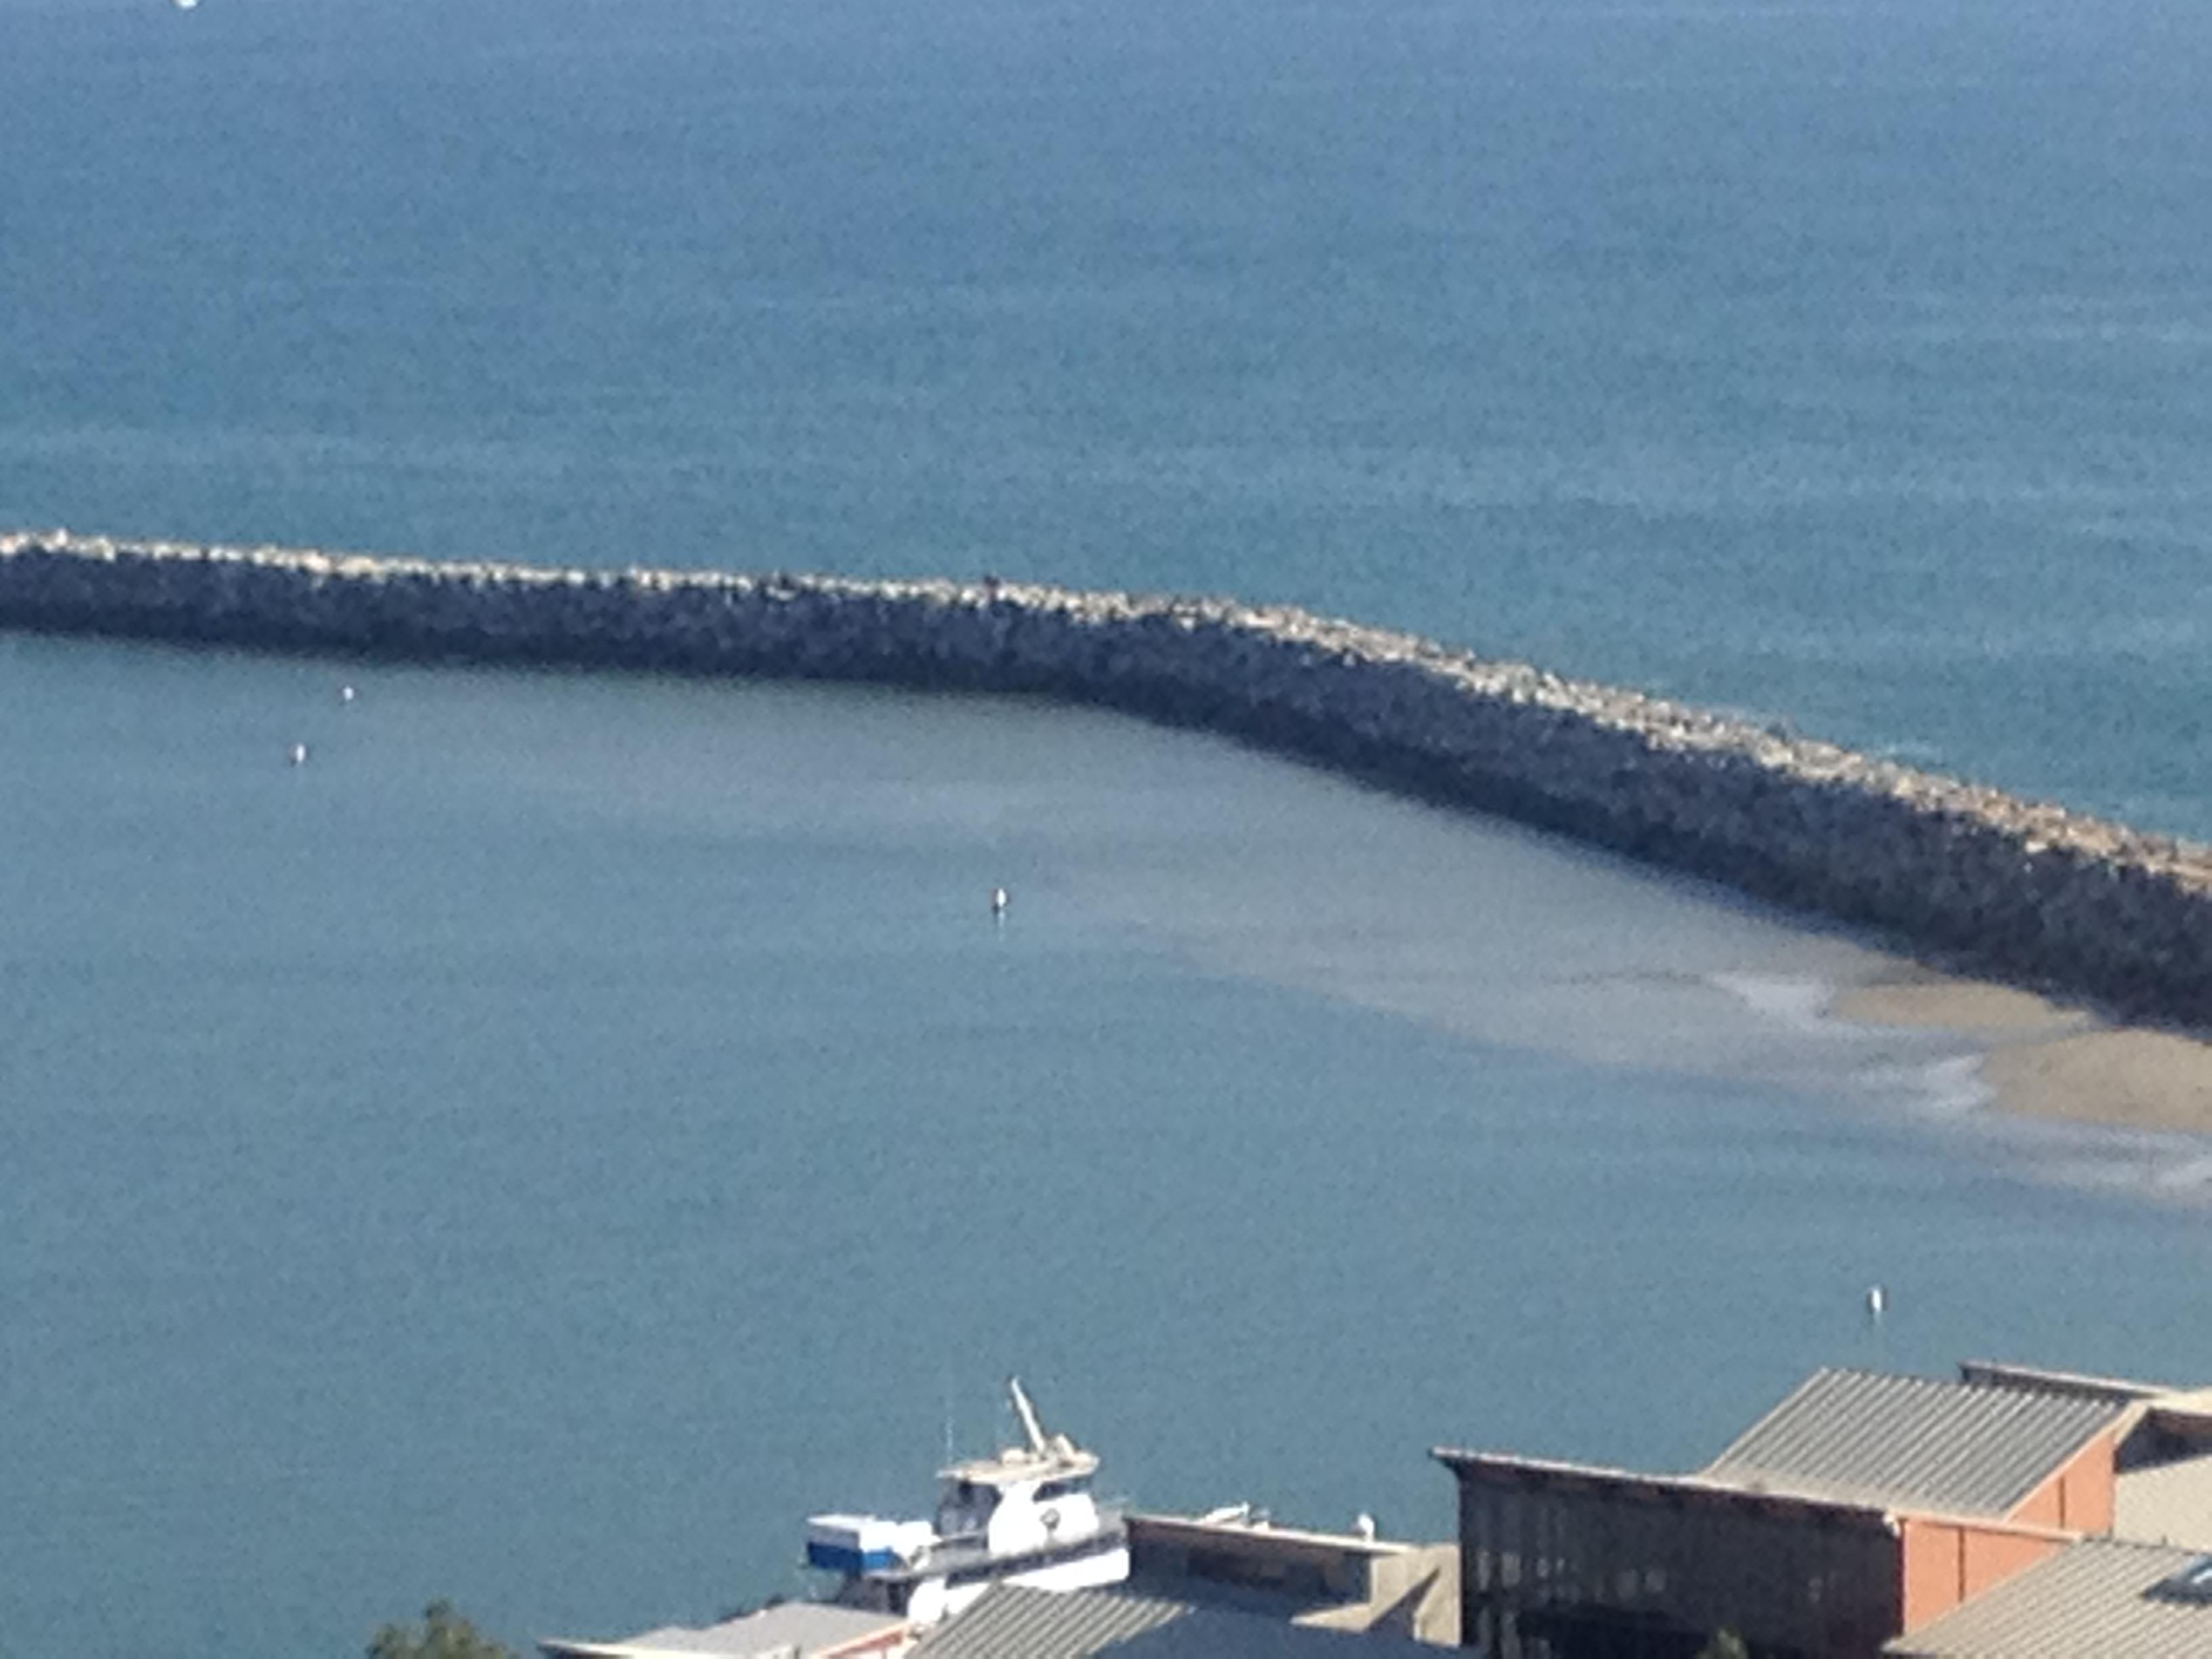 Shoaling Emphasizes Need for Dana Point Harbor Dredging